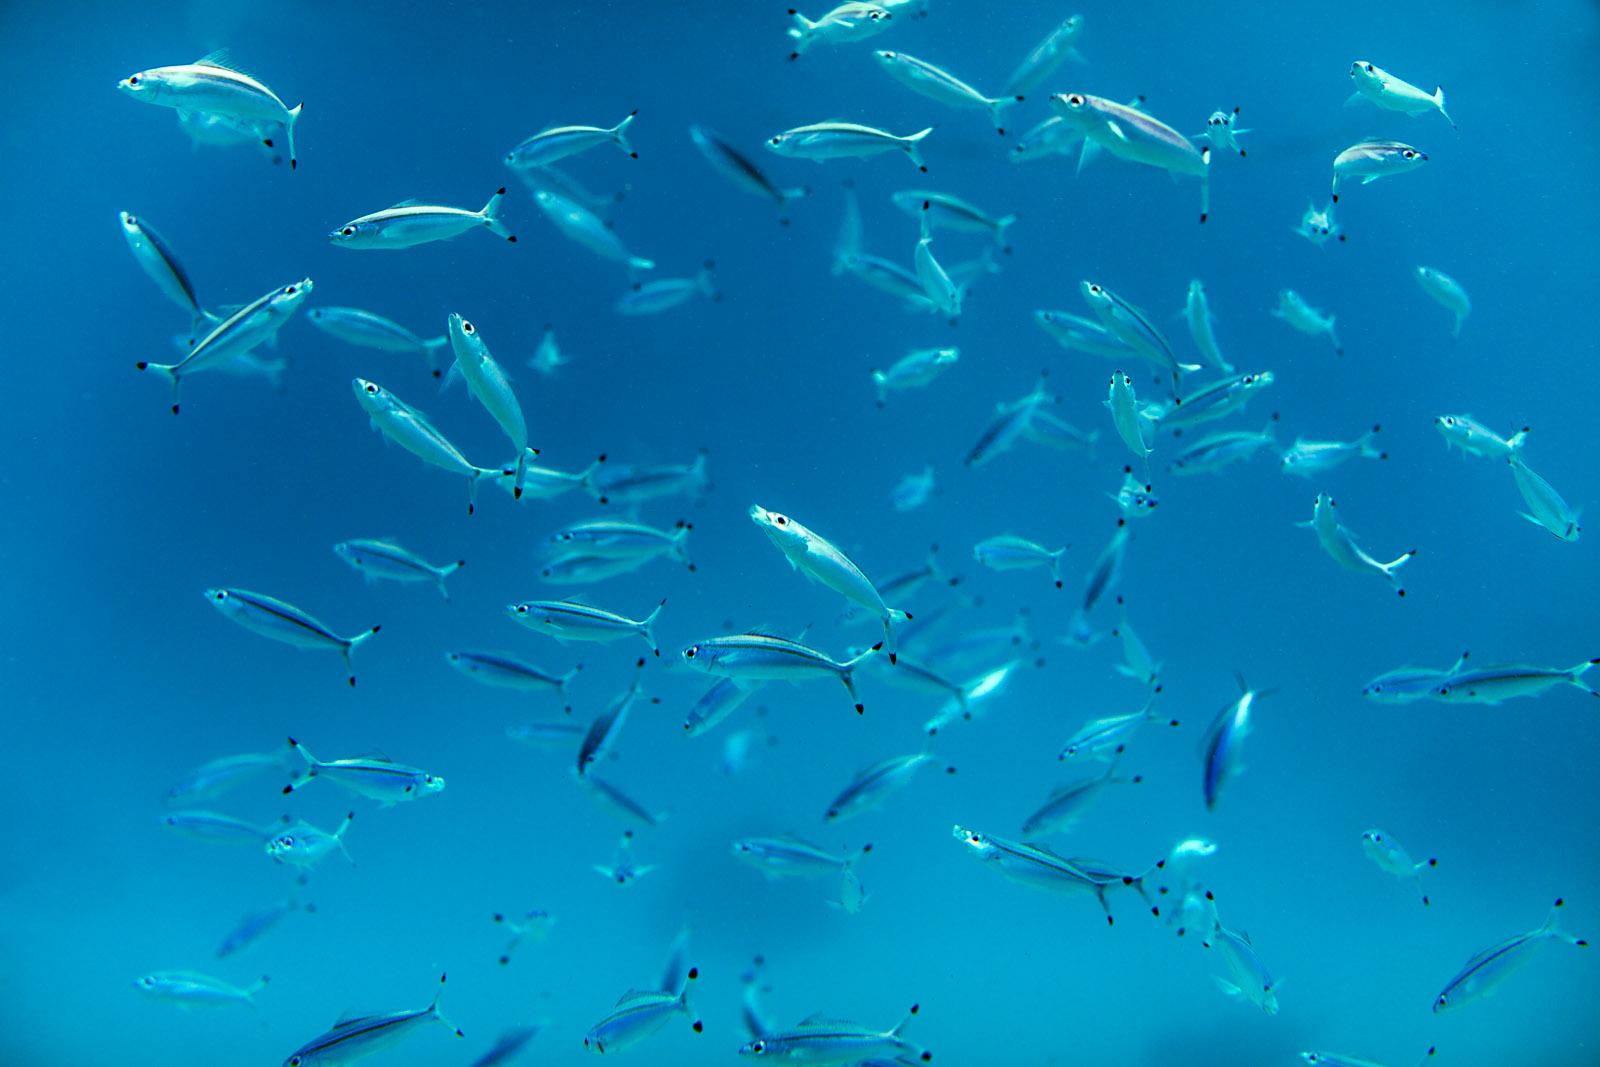 Underwater photo - Undervattensfoto - Fish photo - Fiskfoto - Pemba Island, Zanzibar, Tanzania, Africa, Afrika